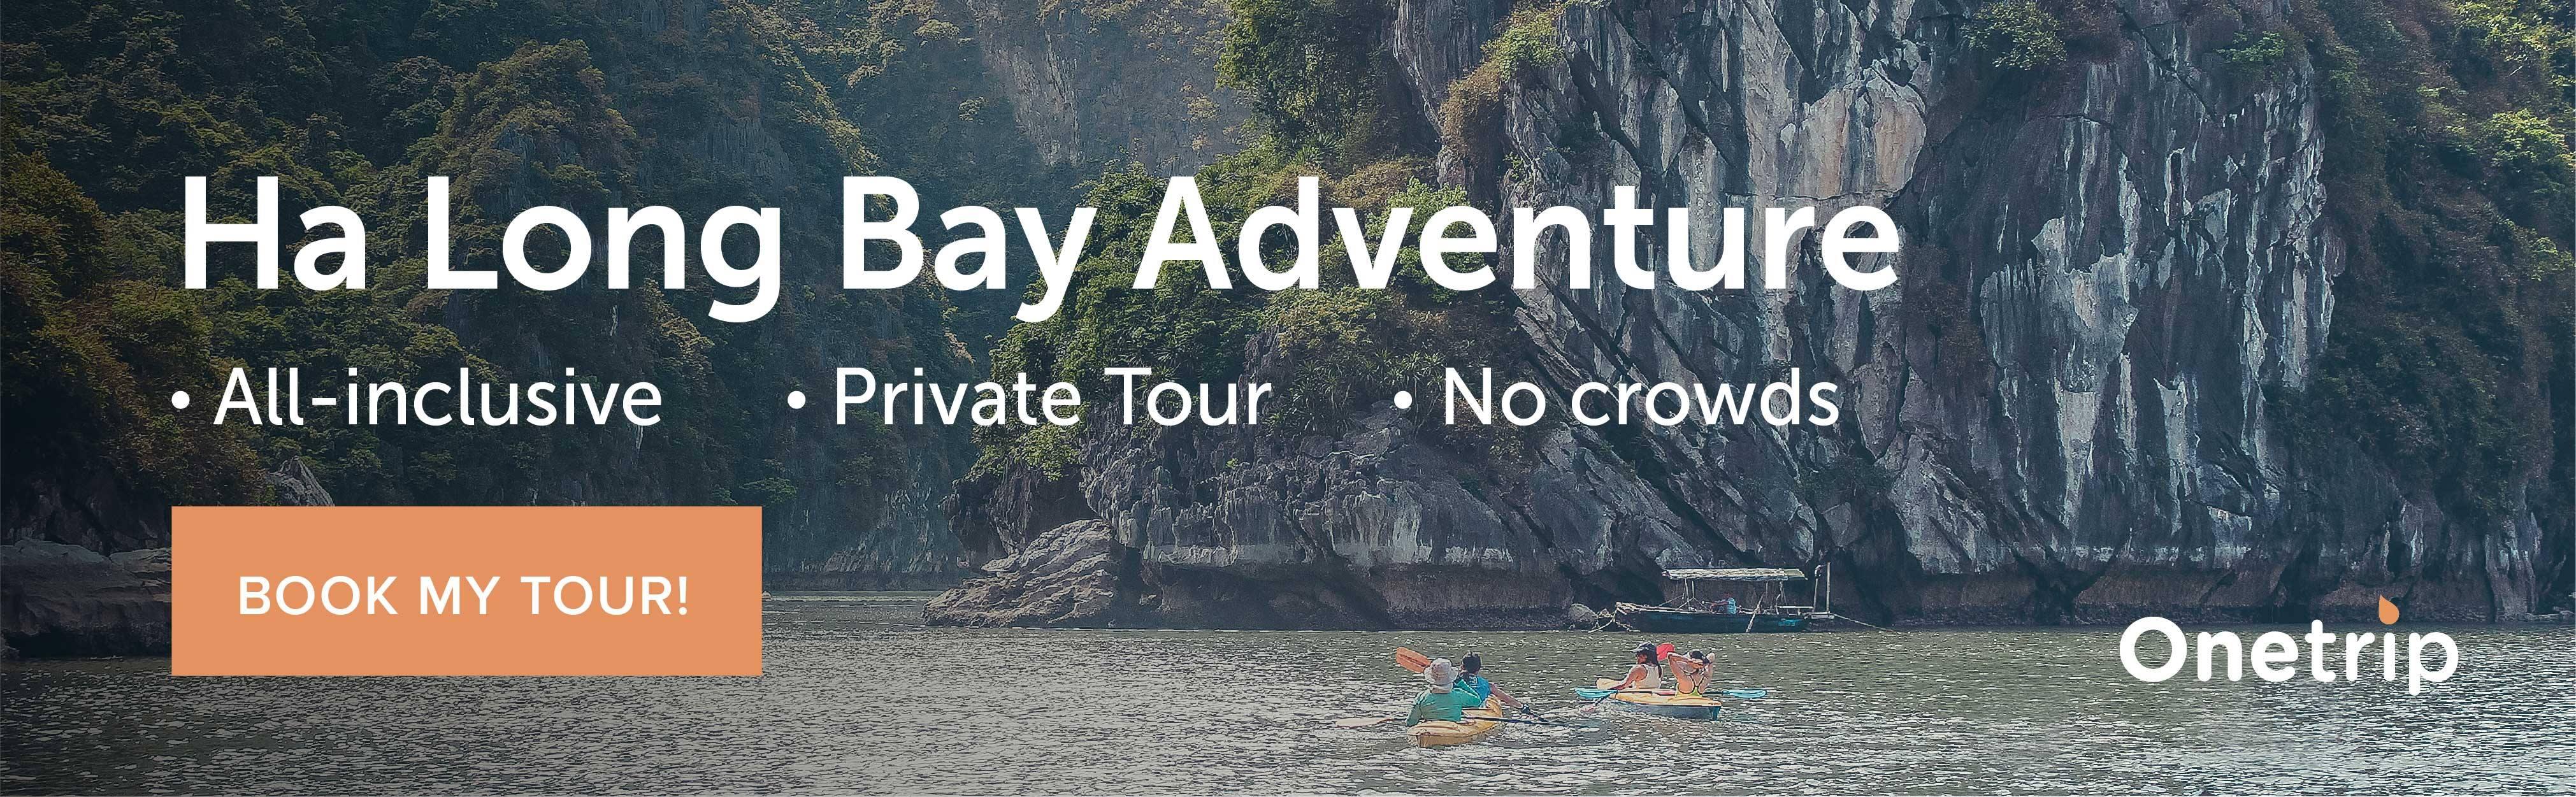 Tour to Ha Long Bay